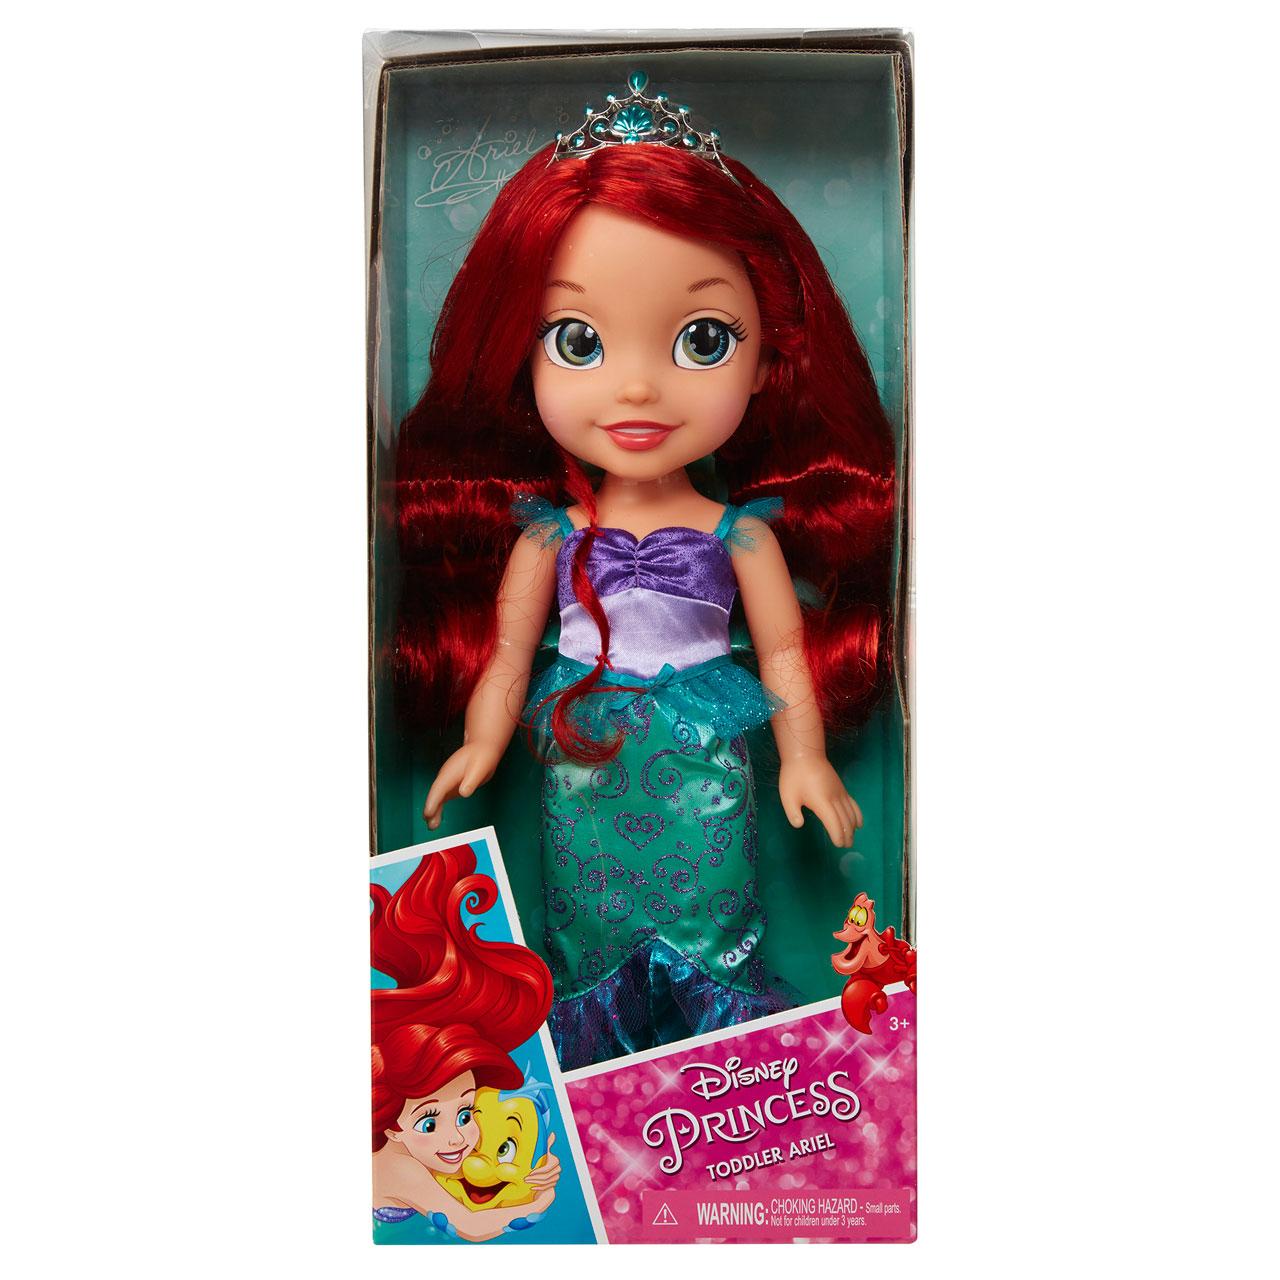 Disney Princess Doll With Lens Eyes Disney Princess